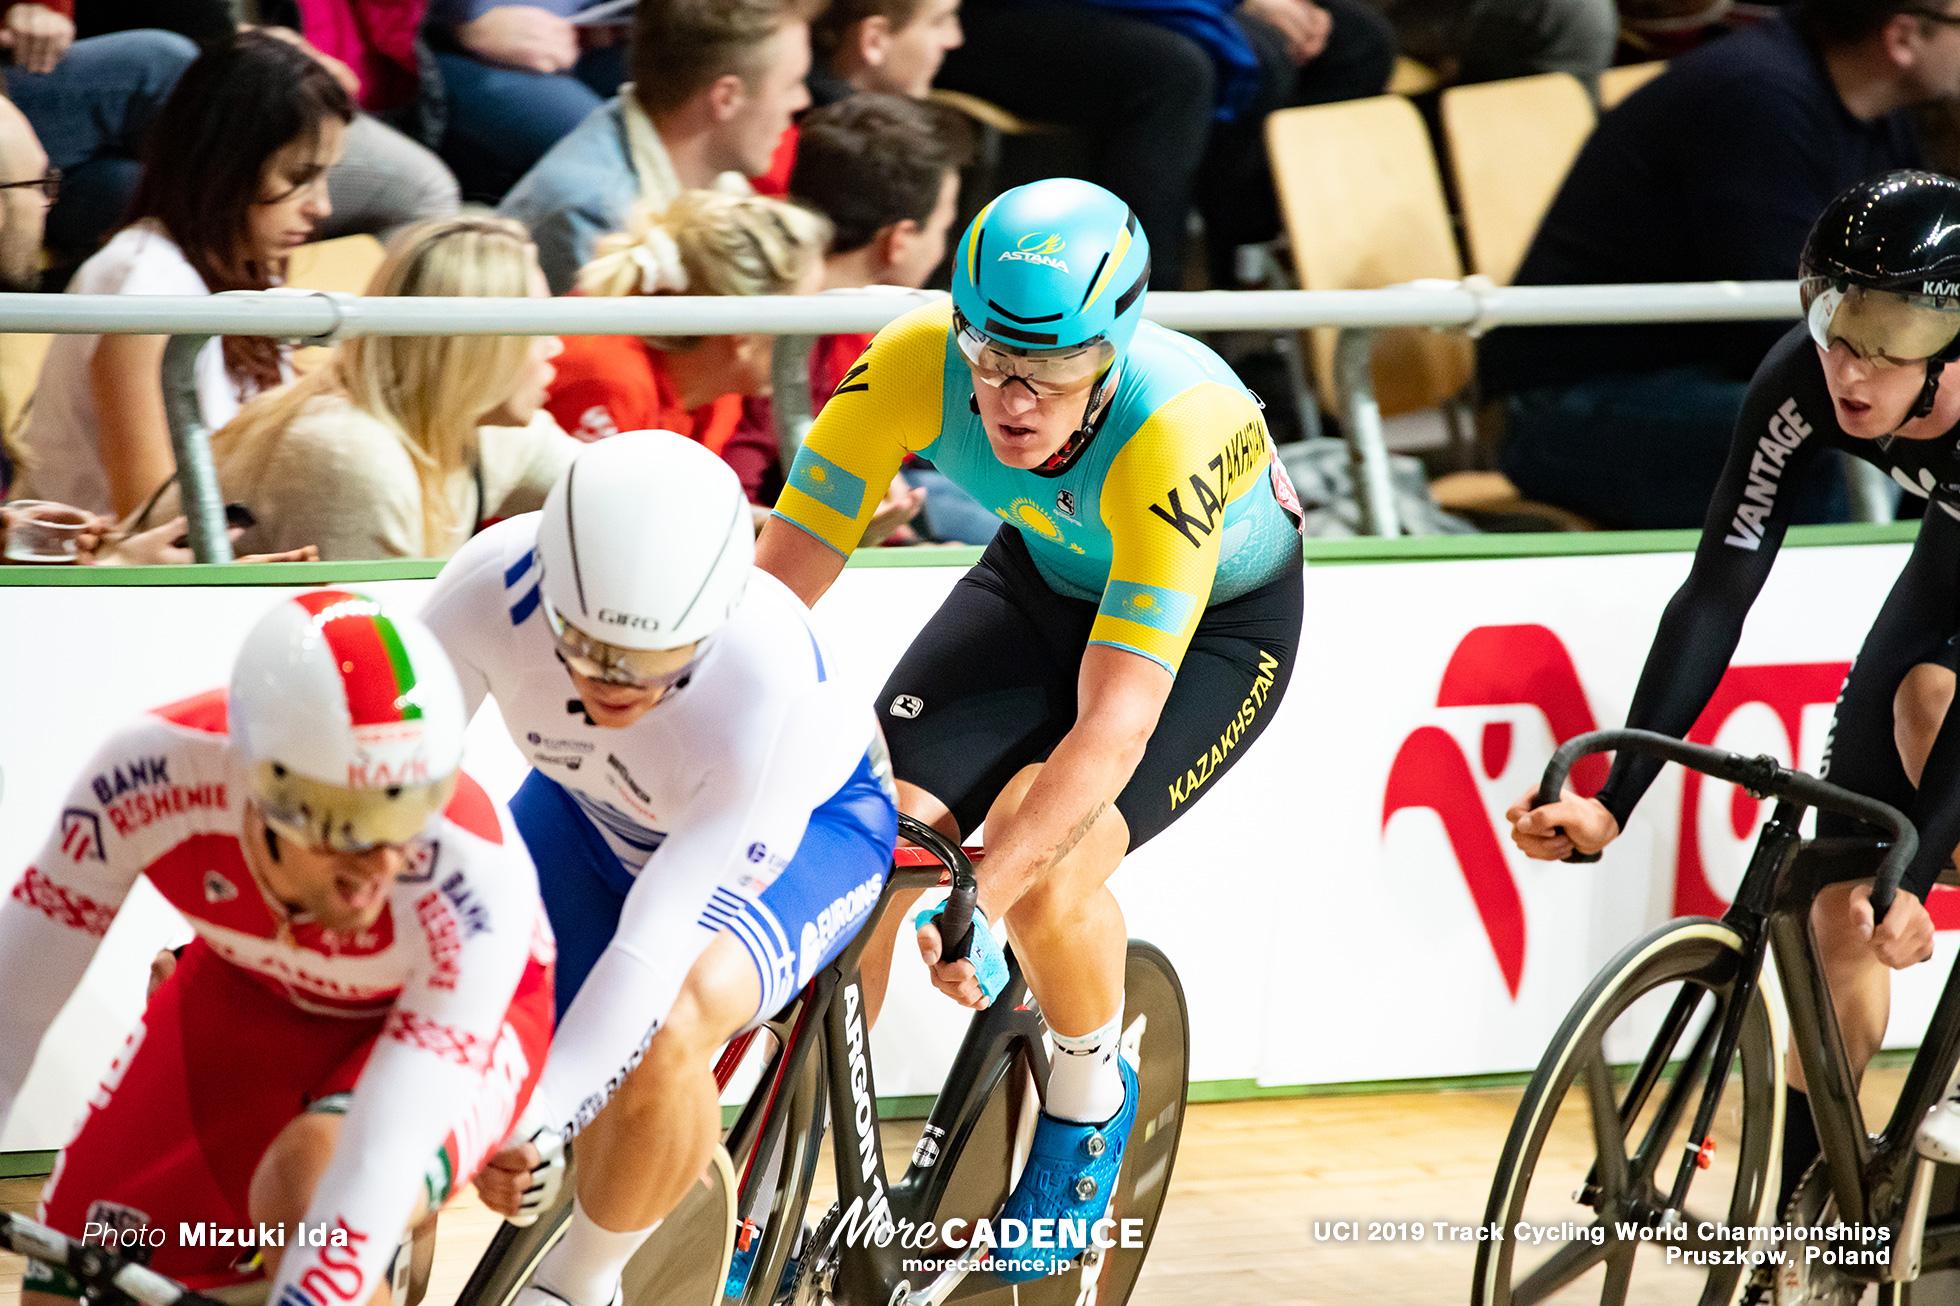 Men's Scratch Race / 2019 Track Cycling World Championships Pruszków, Poland